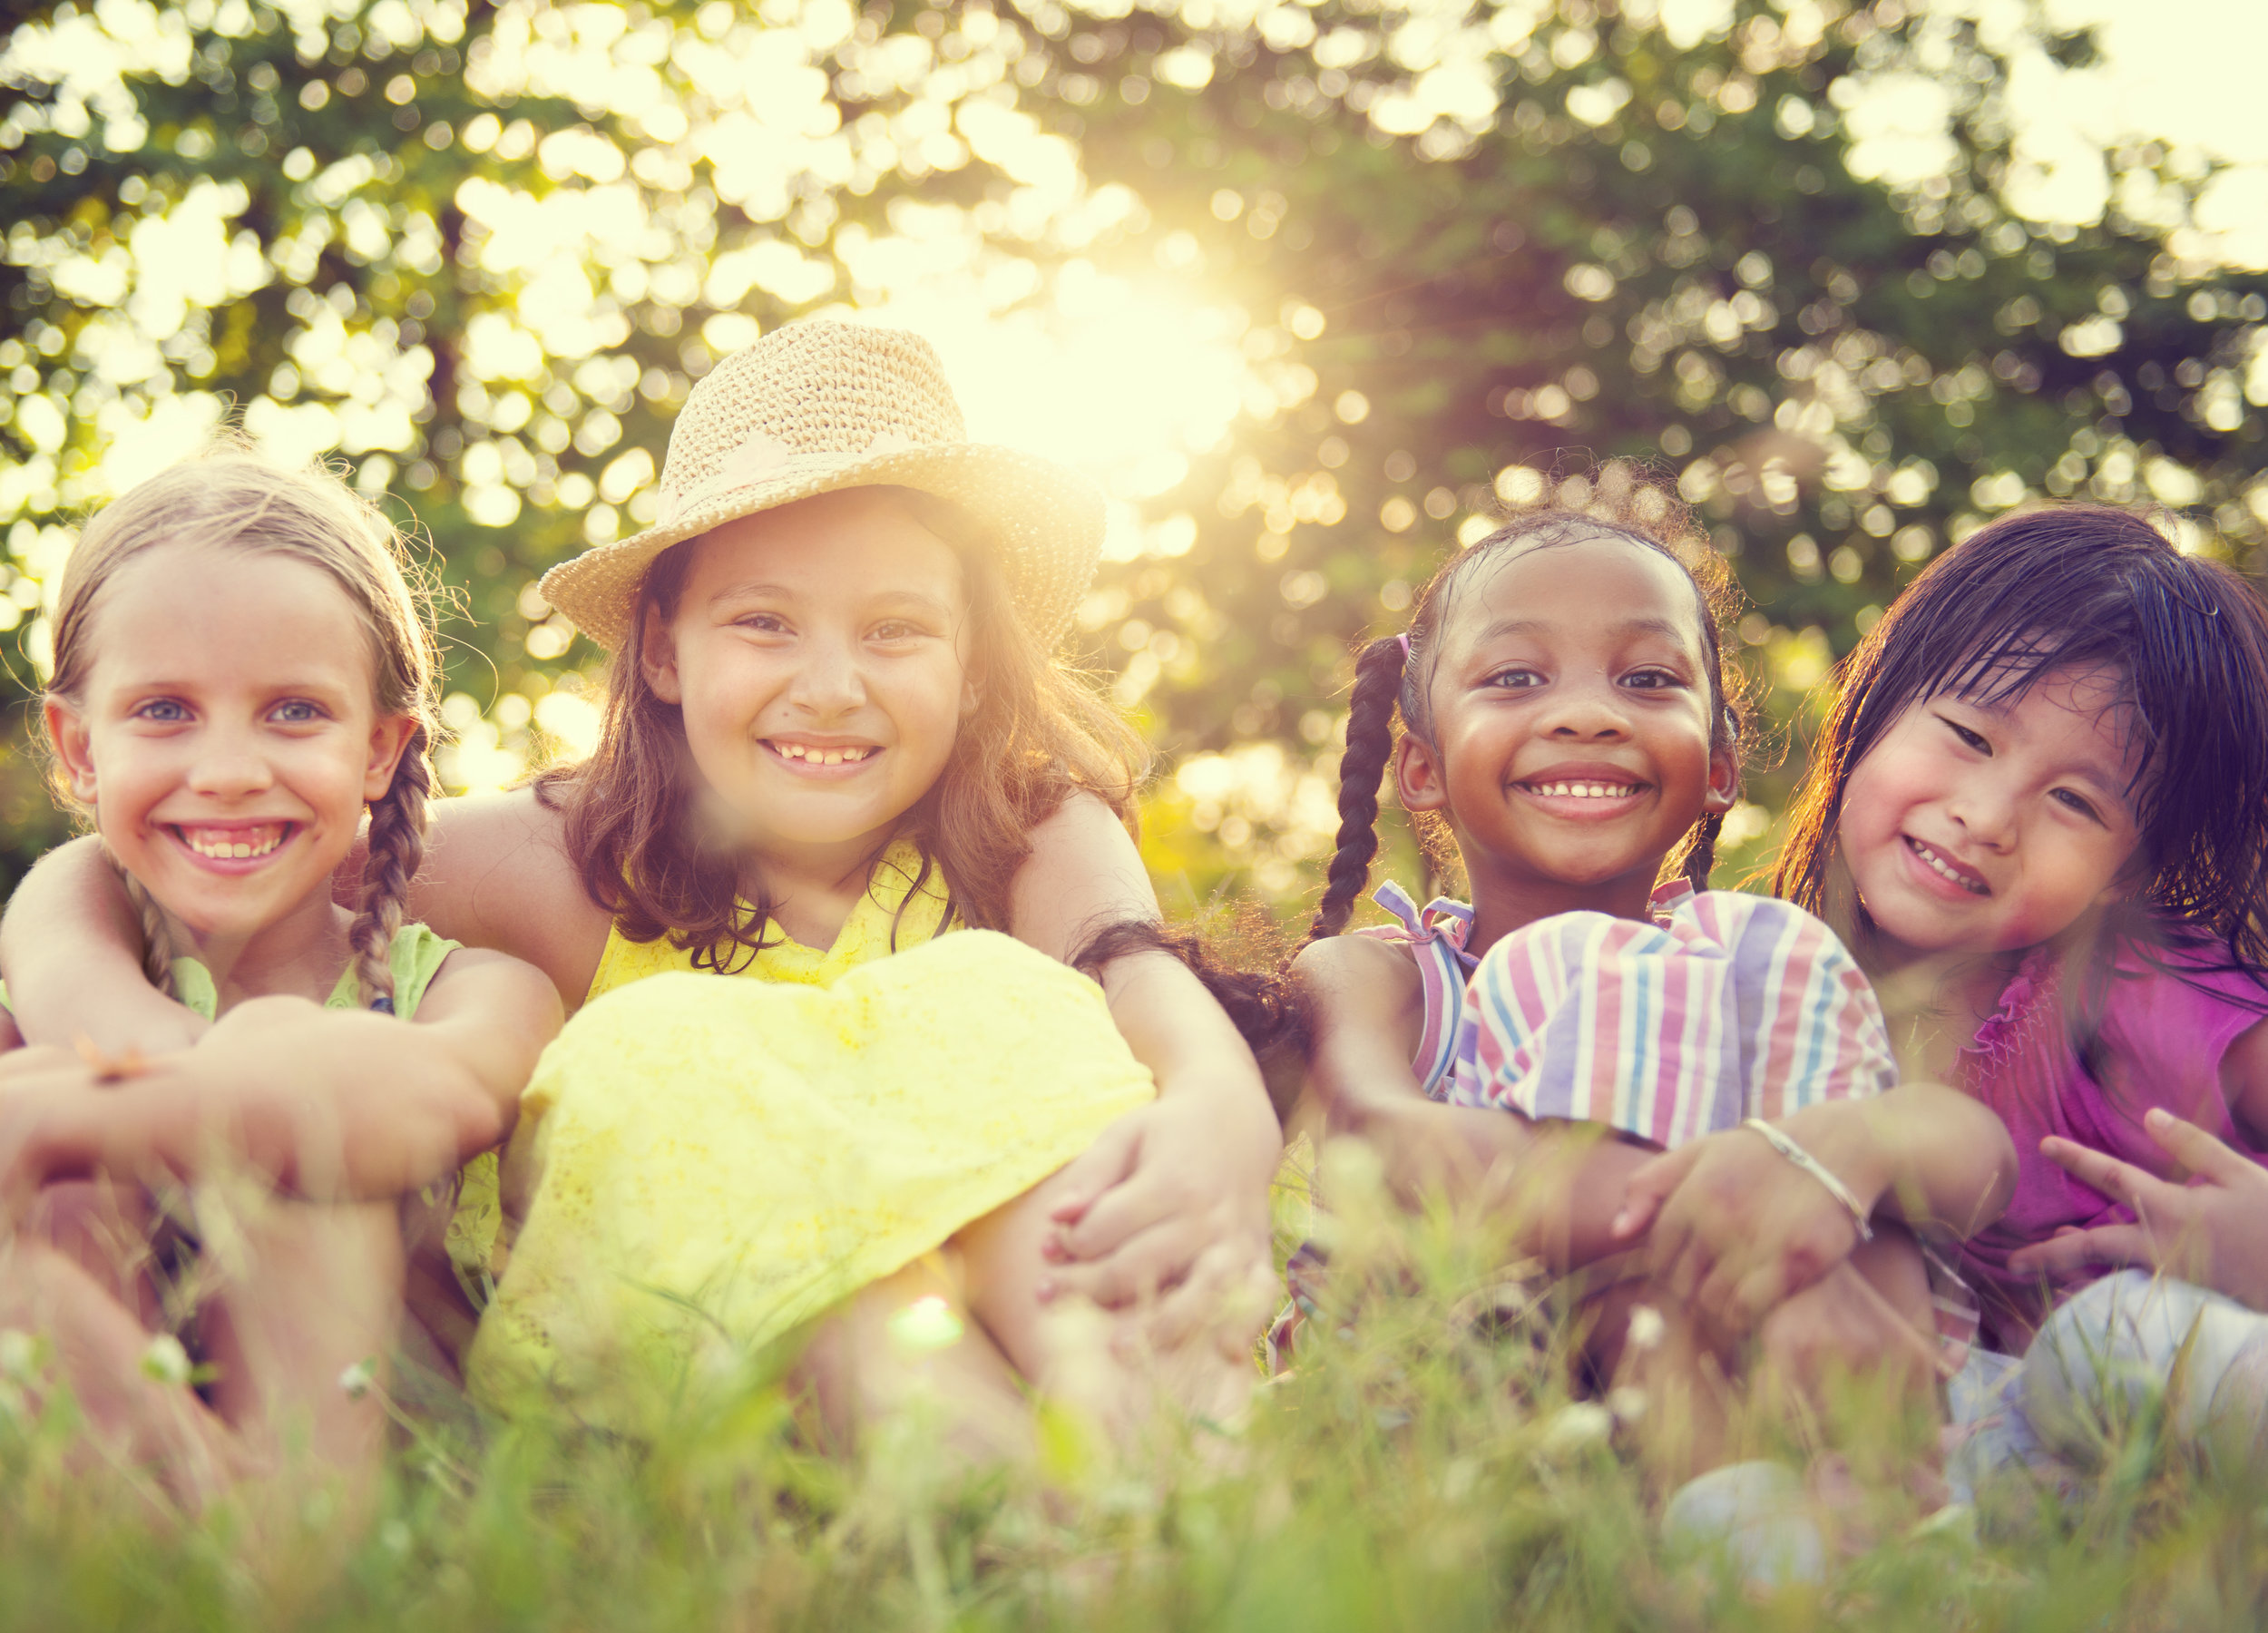 children-in-a-park-30b41b86c0a46850.jpg